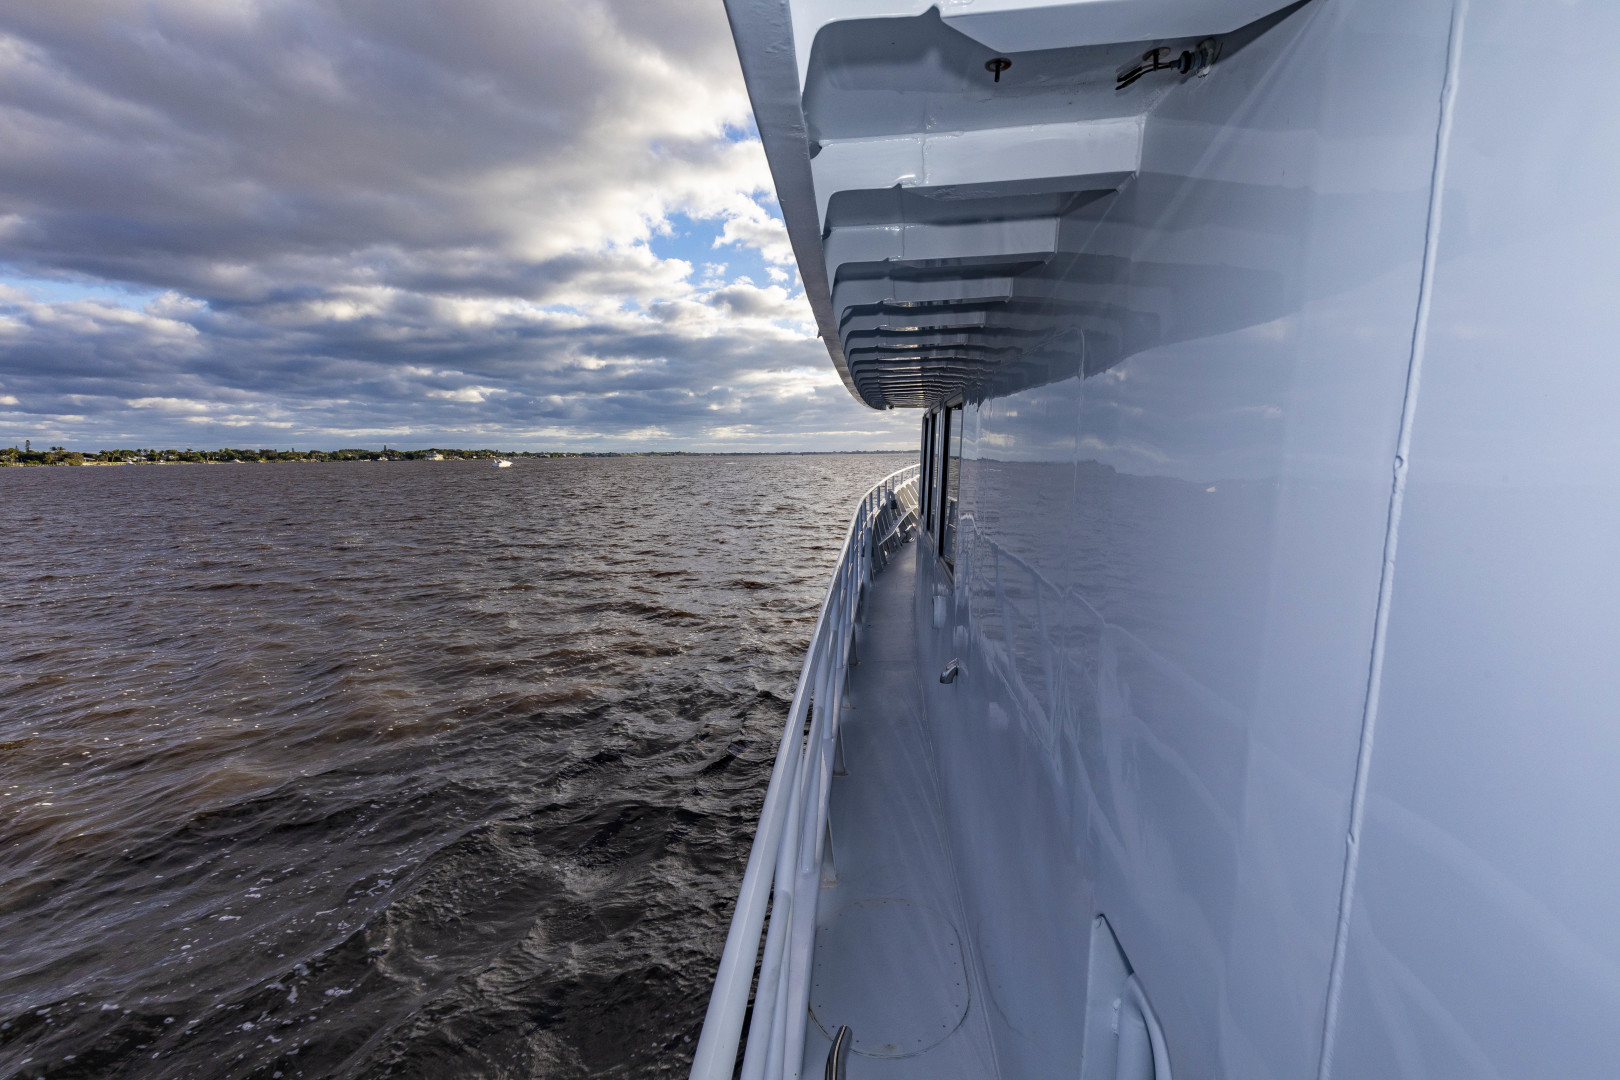 GlassTech-Expedition Yacht 2018-Reset Stuart-Florida-United States-Sidedeck-1568637 | Thumbnail